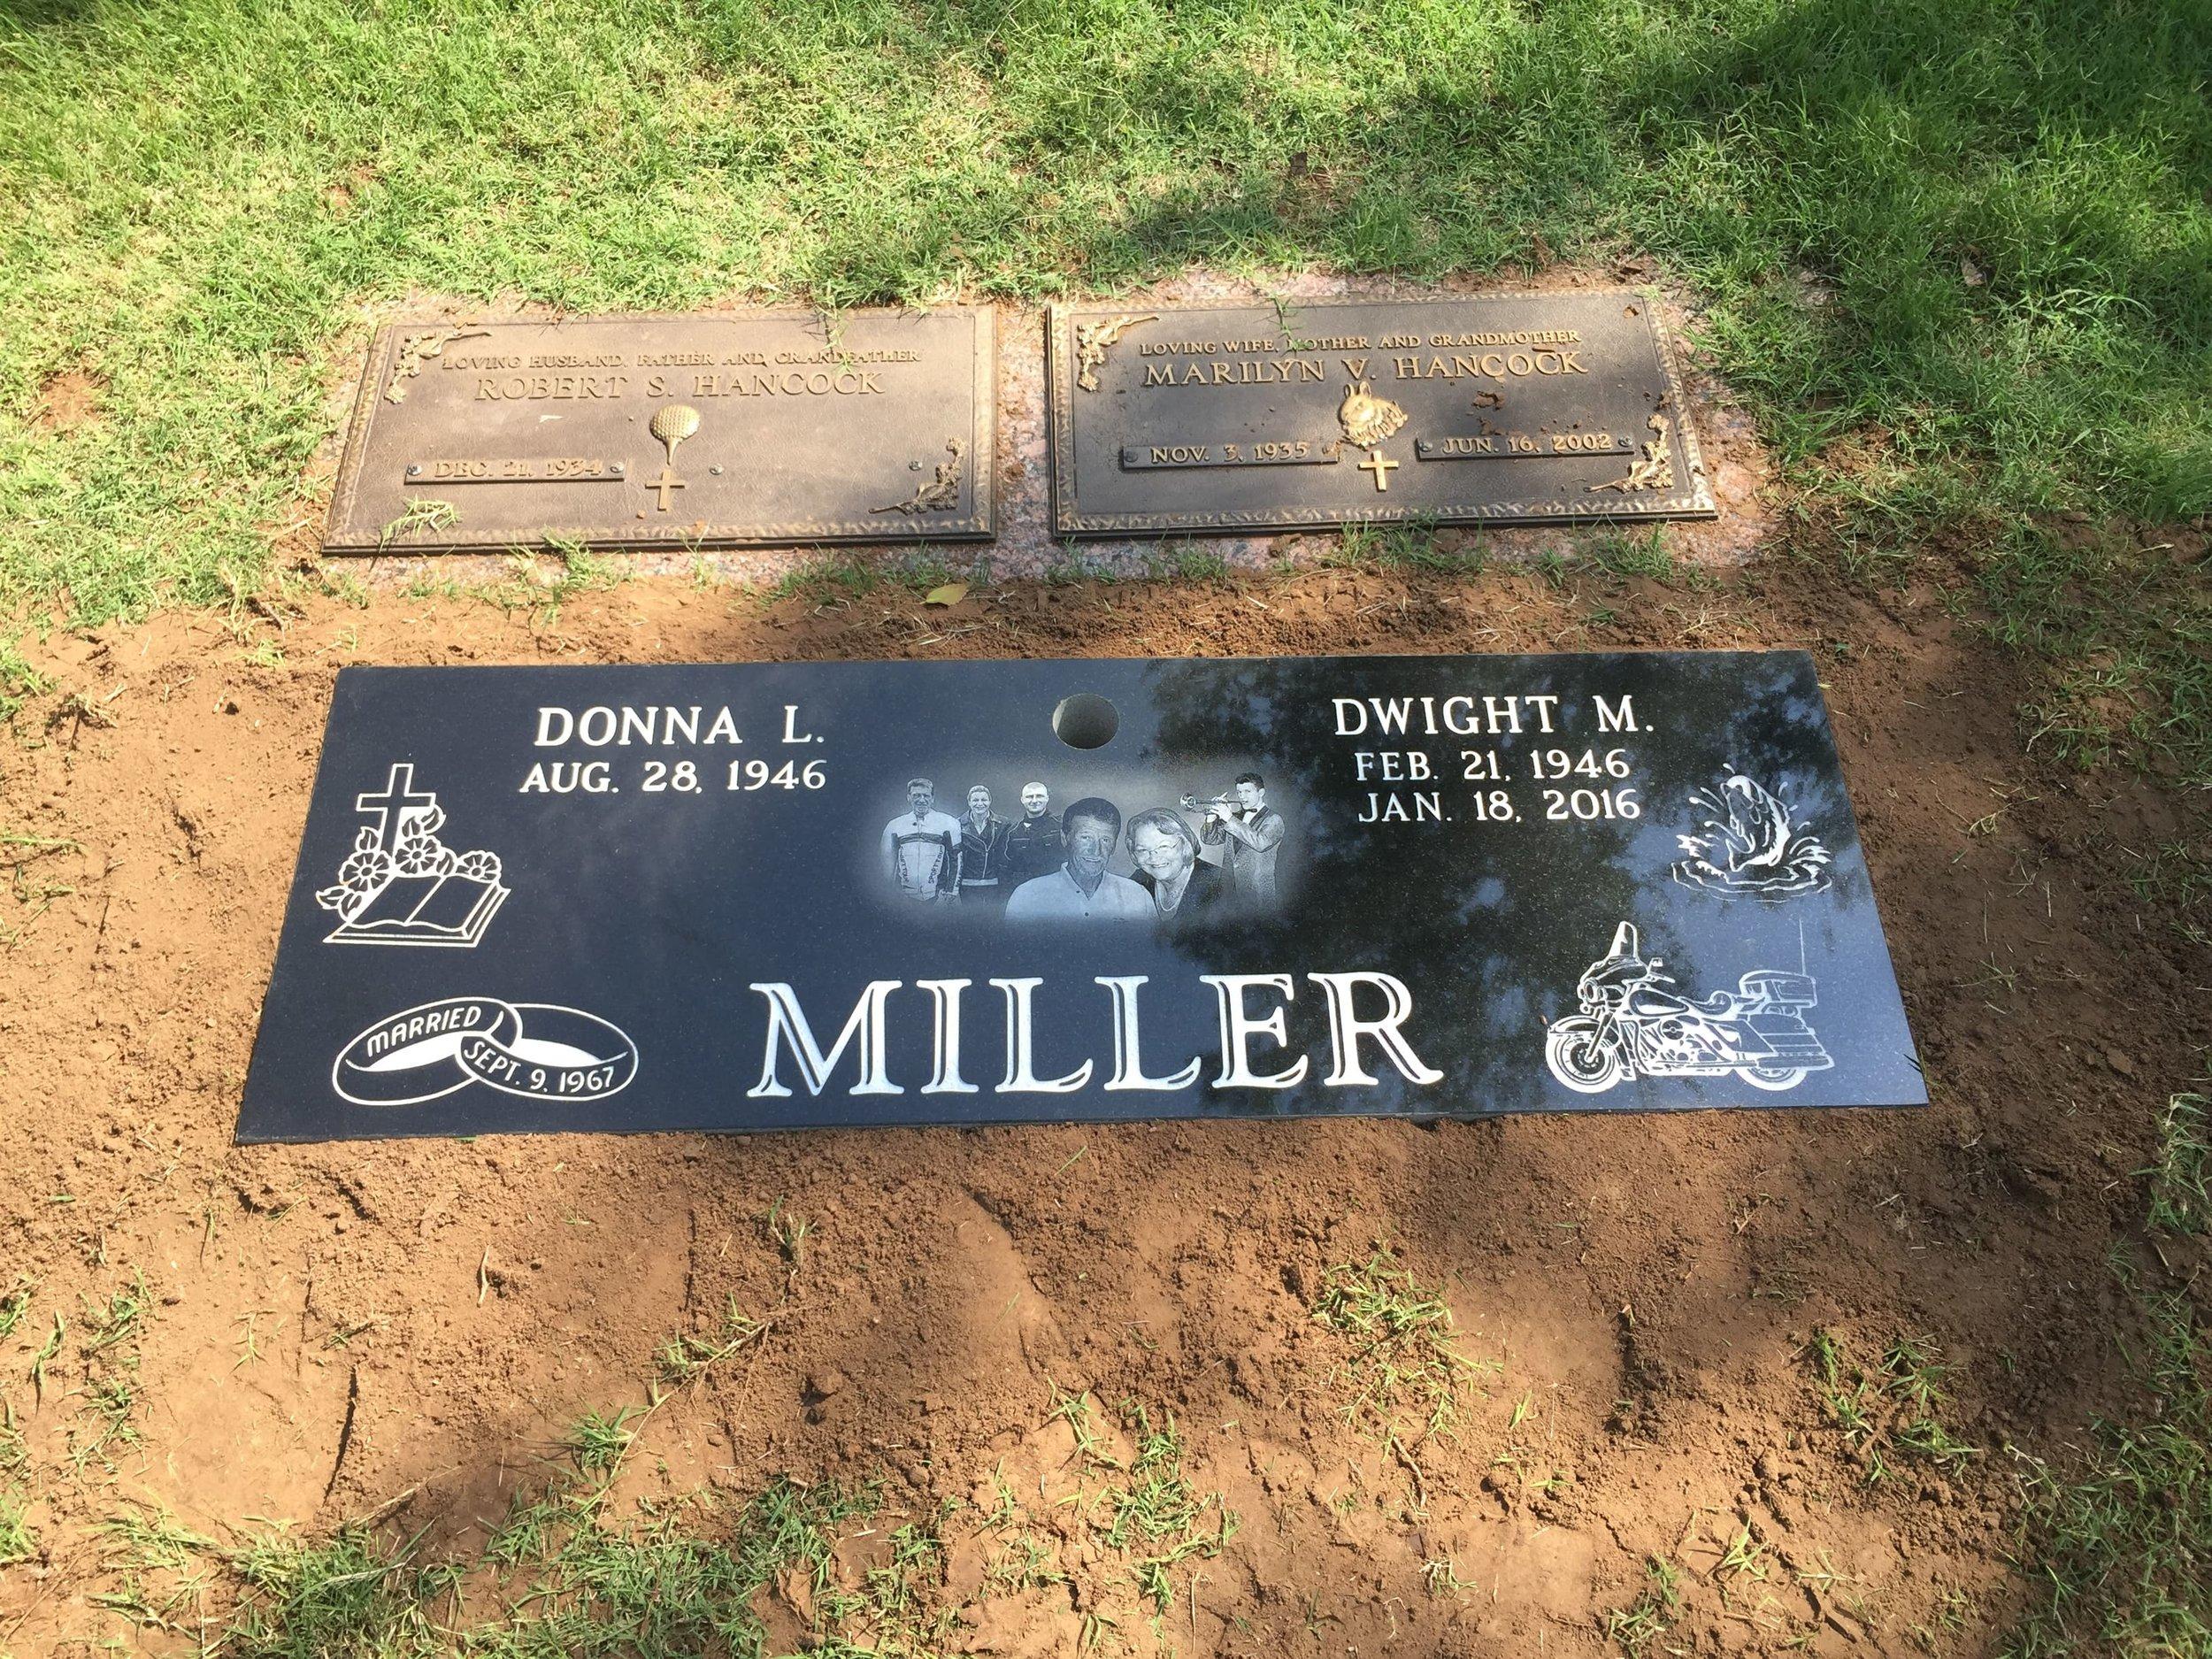 10. Memorial Park Cemetery